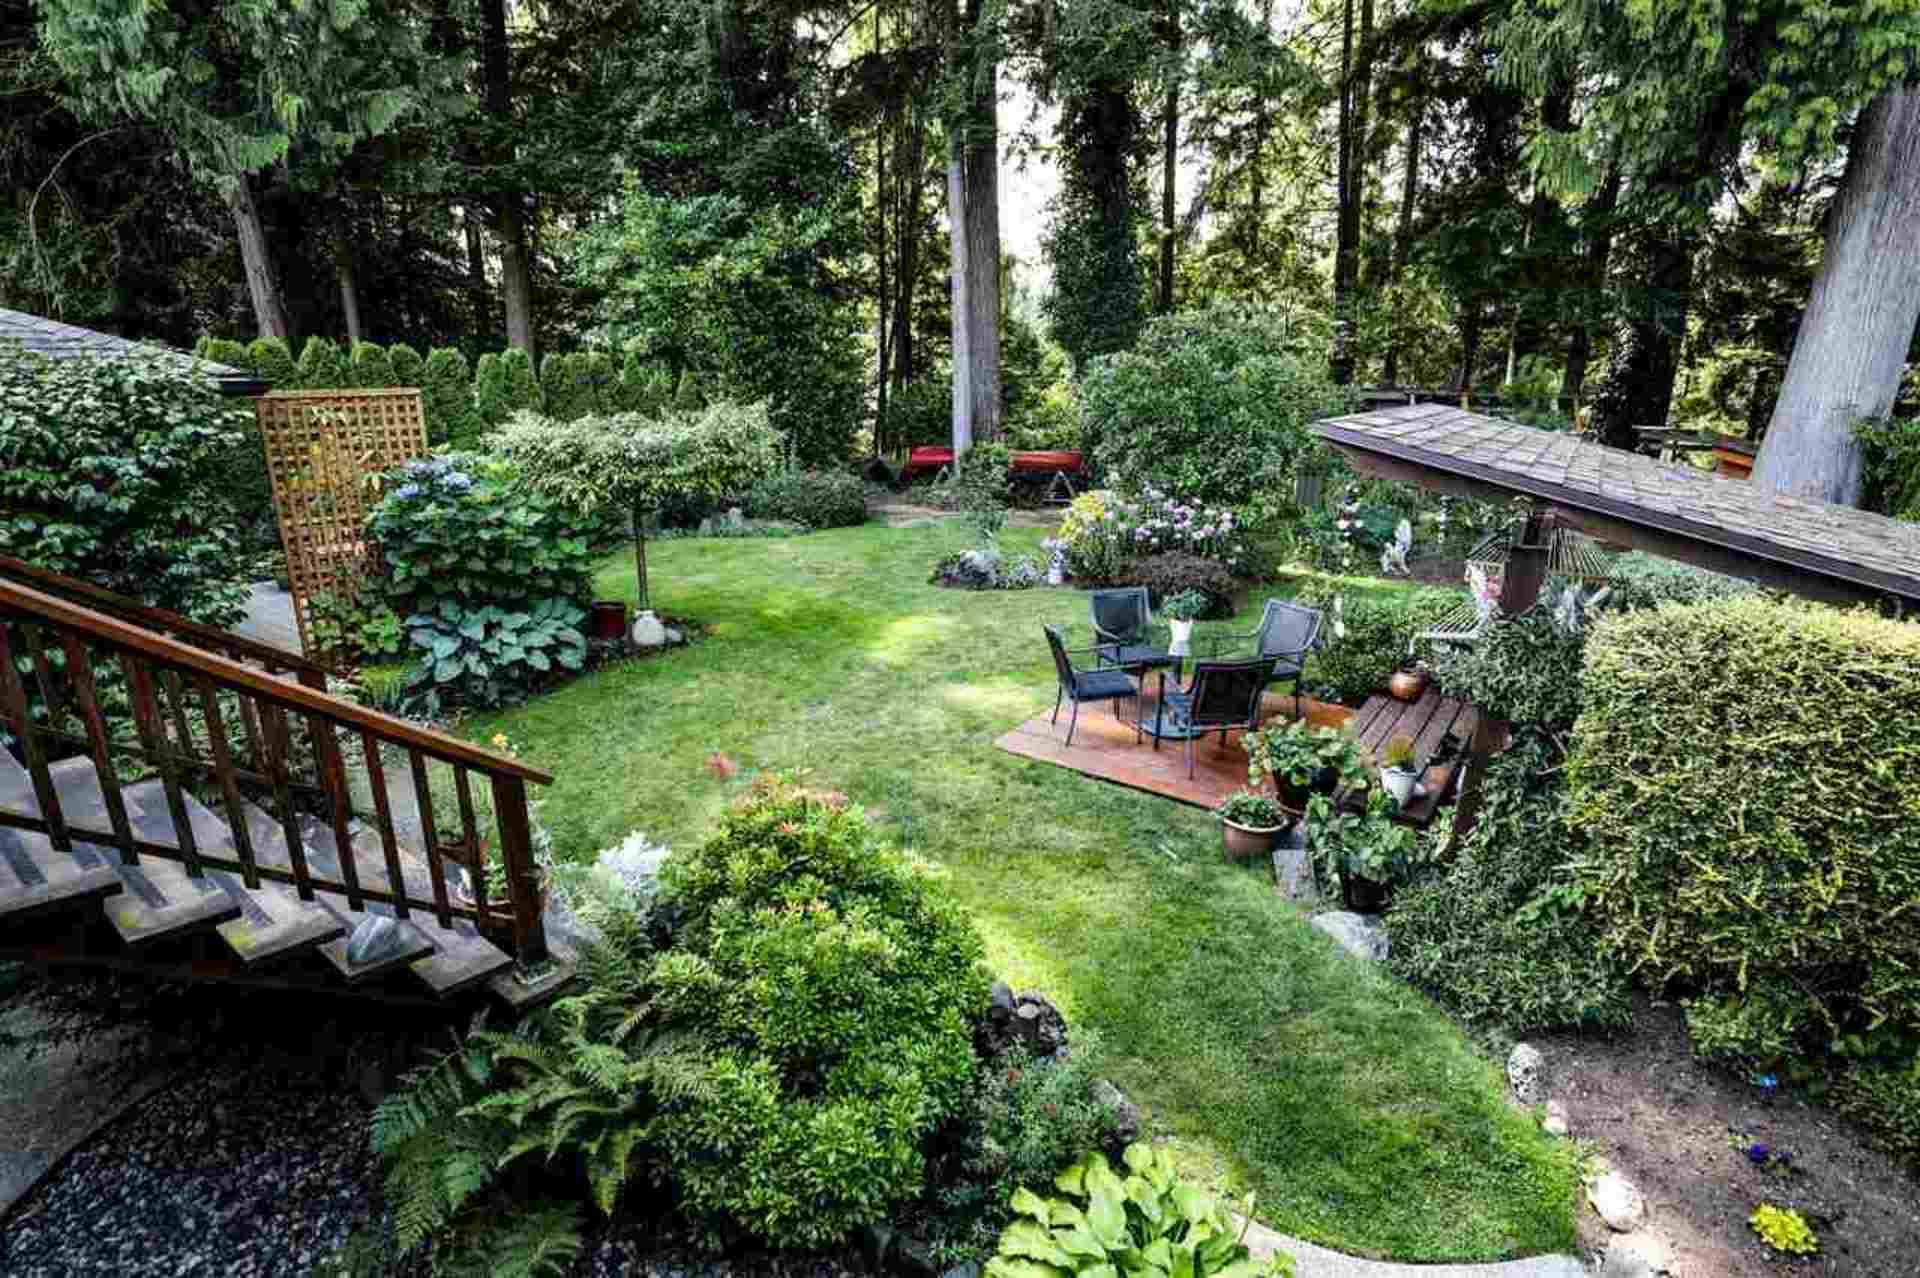 2491-kilmarnock-crescent-lynn-valley-north-vancouver-03 at 2491 Kilmarnock Crescent, Lynn Valley, North Vancouver